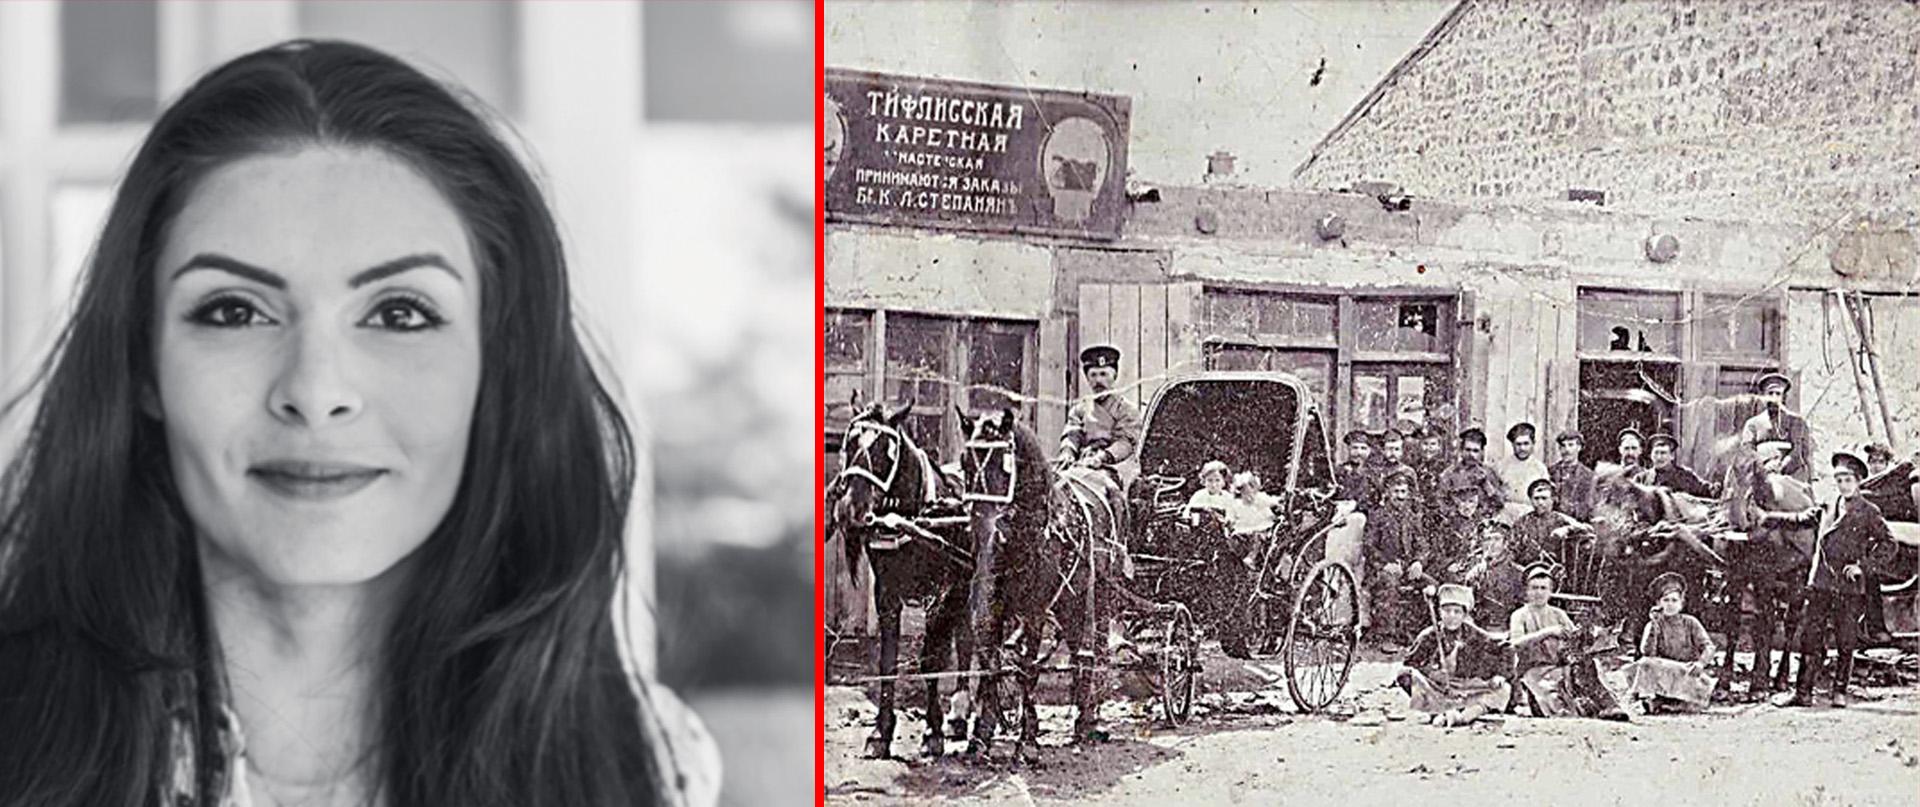 GOST KOLUMNIST: MARIA GRIGORYAN Genocid nad Armencima i sudbina mojih predaka